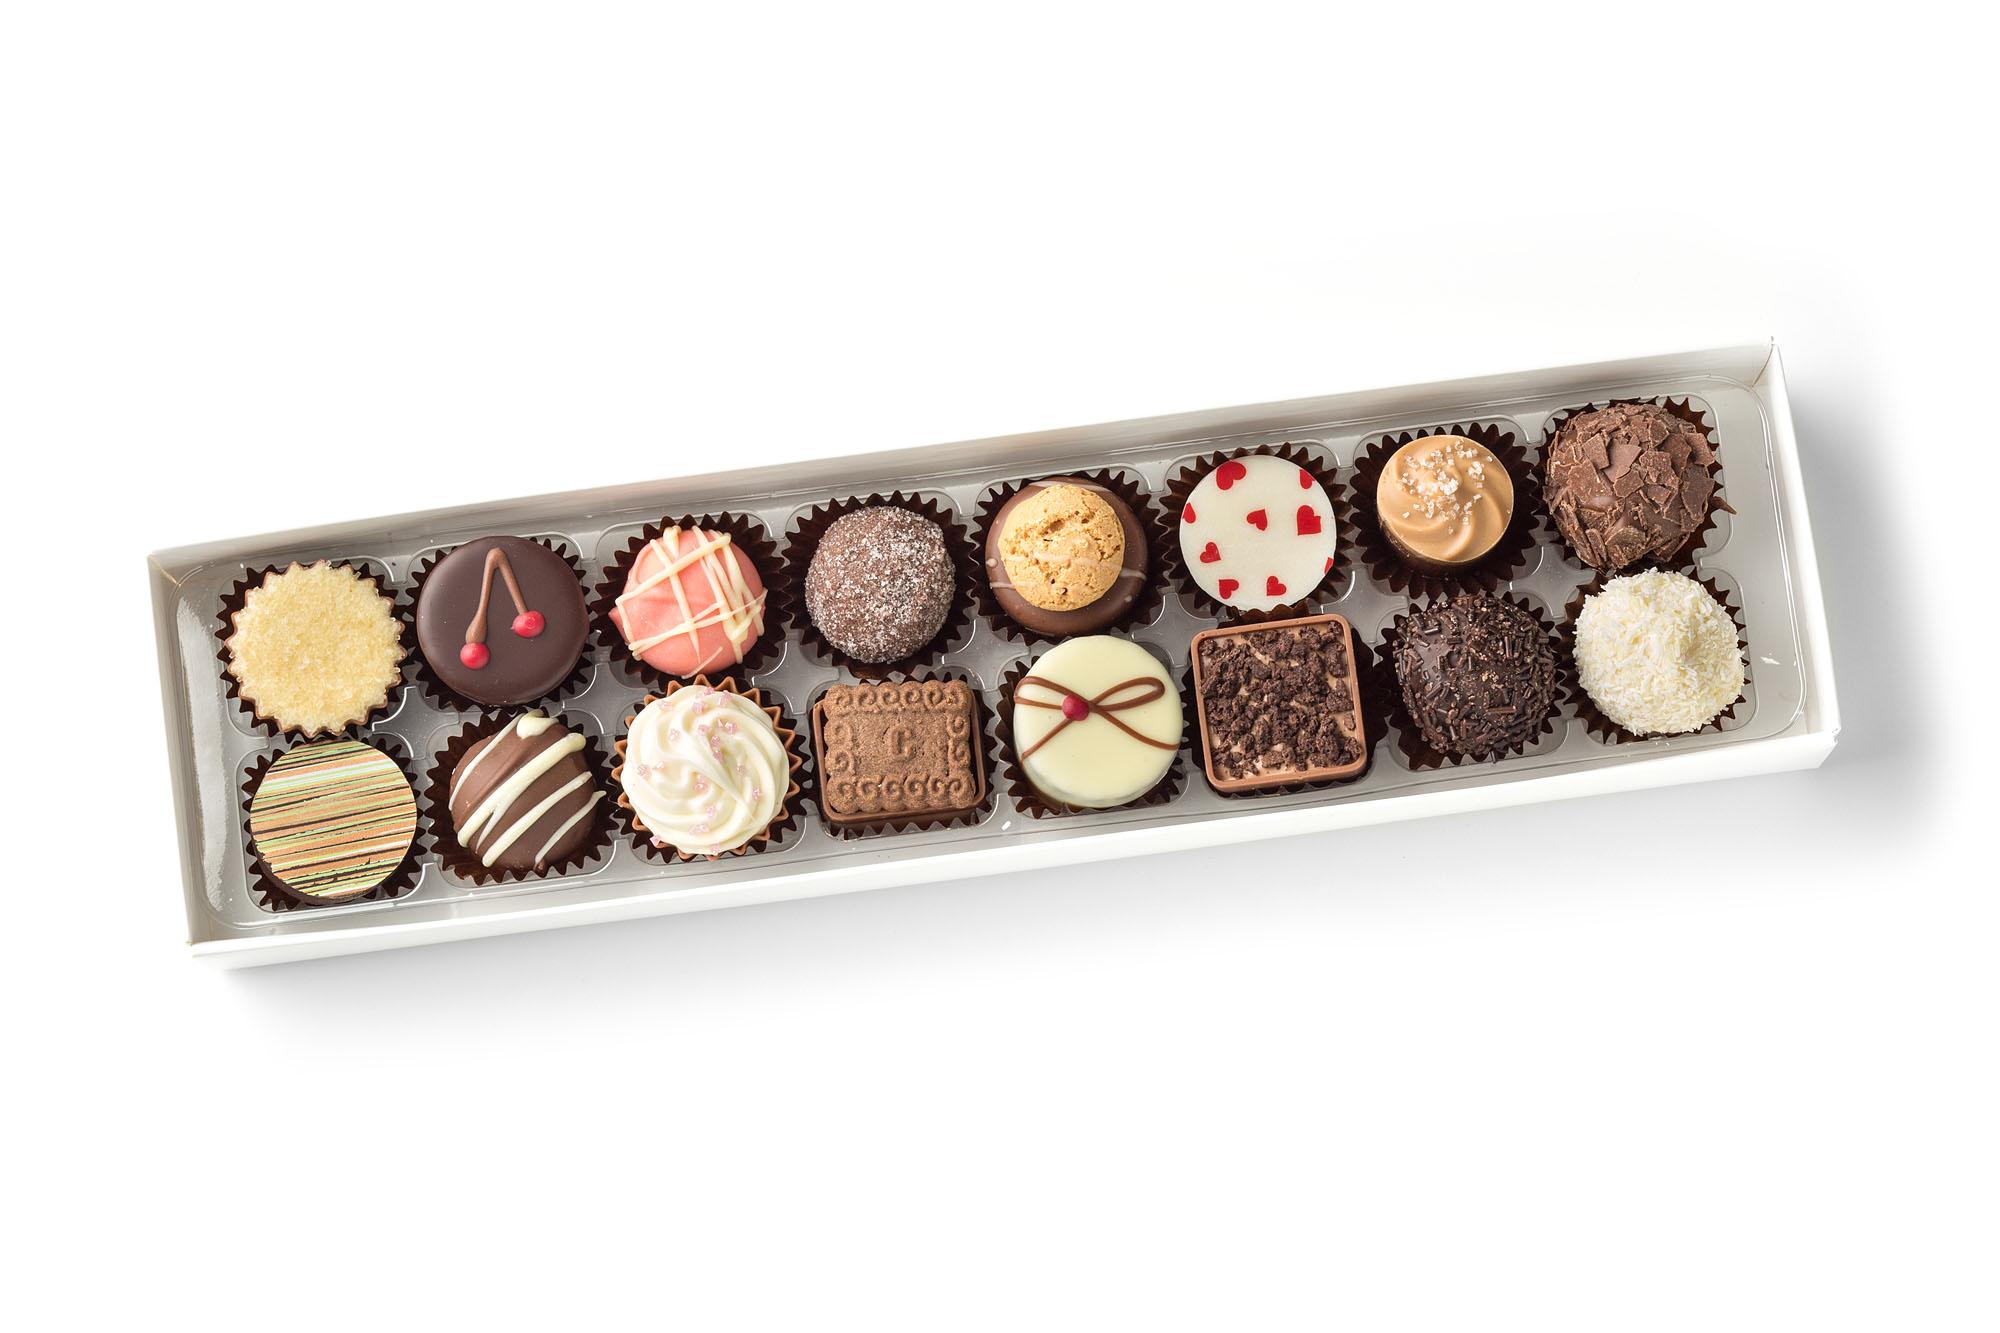 chocolate truffles, creams and pralines